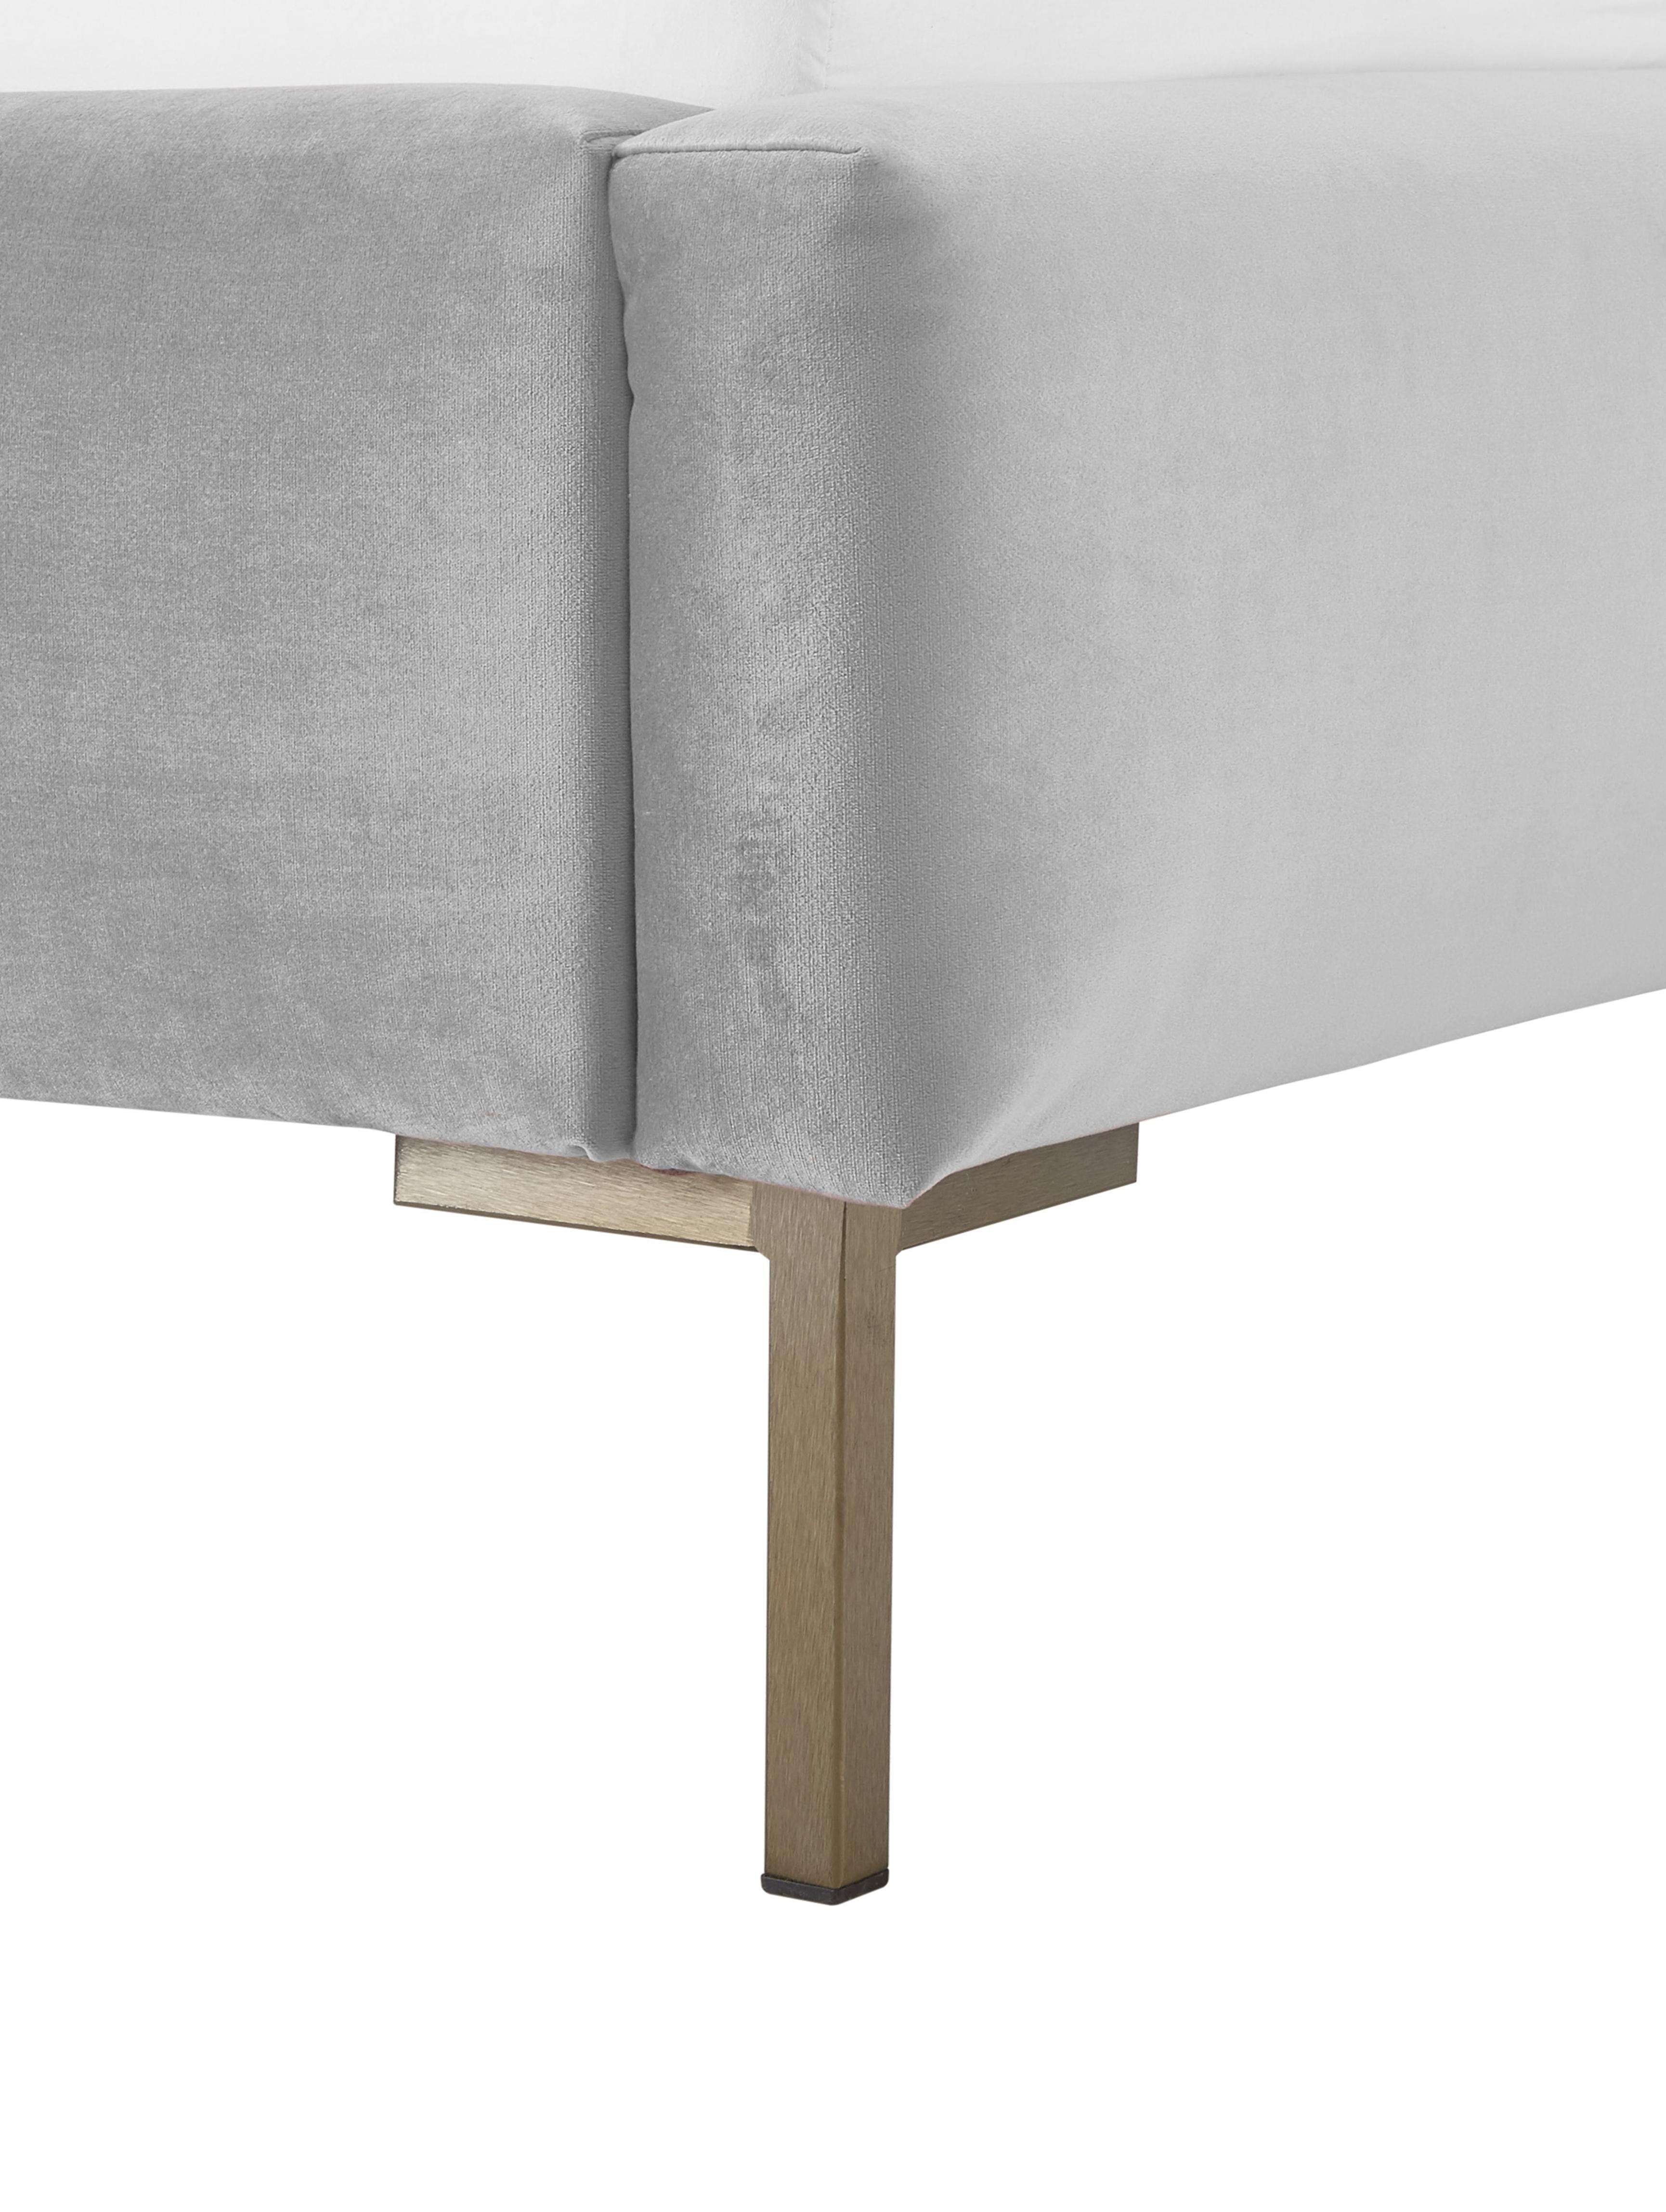 Samt-Polsterbett Dusk, Korpus: Massives Kiefernholz, Füße: Metall, pulverbeschichtet, Bezug: Polyestersamt 30.000 Sche, Hellgrau, 180 x 200 cm